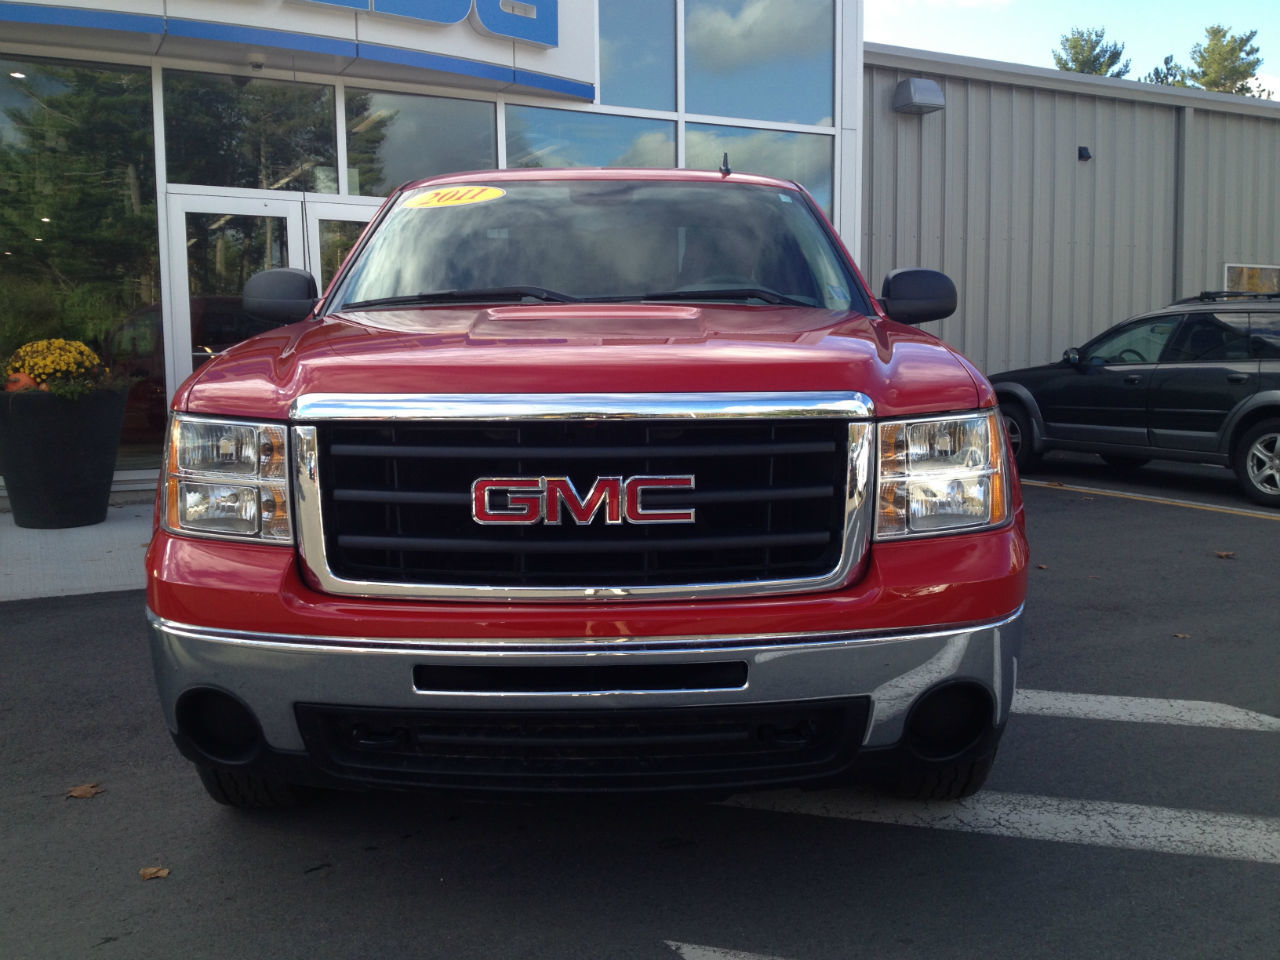 Used 2011 Gmc Sierra 1500 Sl Nevada Edition In Kentville